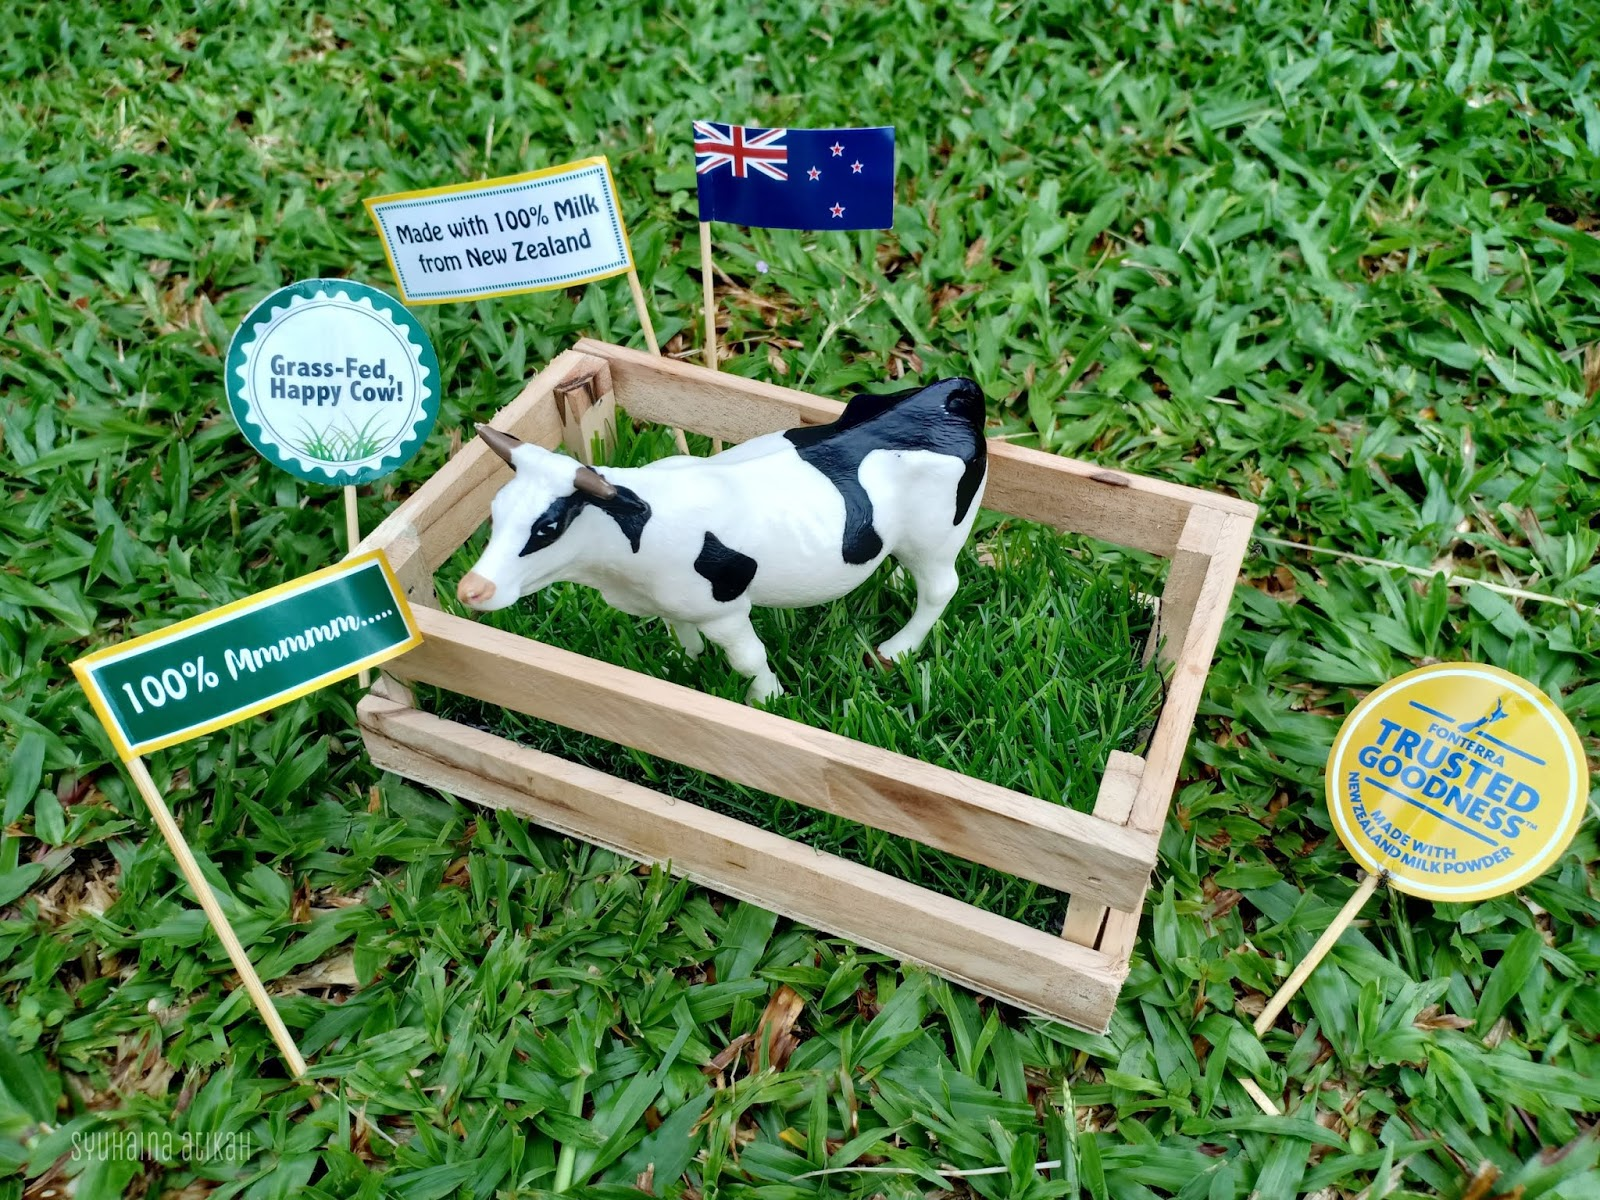 Susu Fernleaf 100% Peratus Dari New Zealand